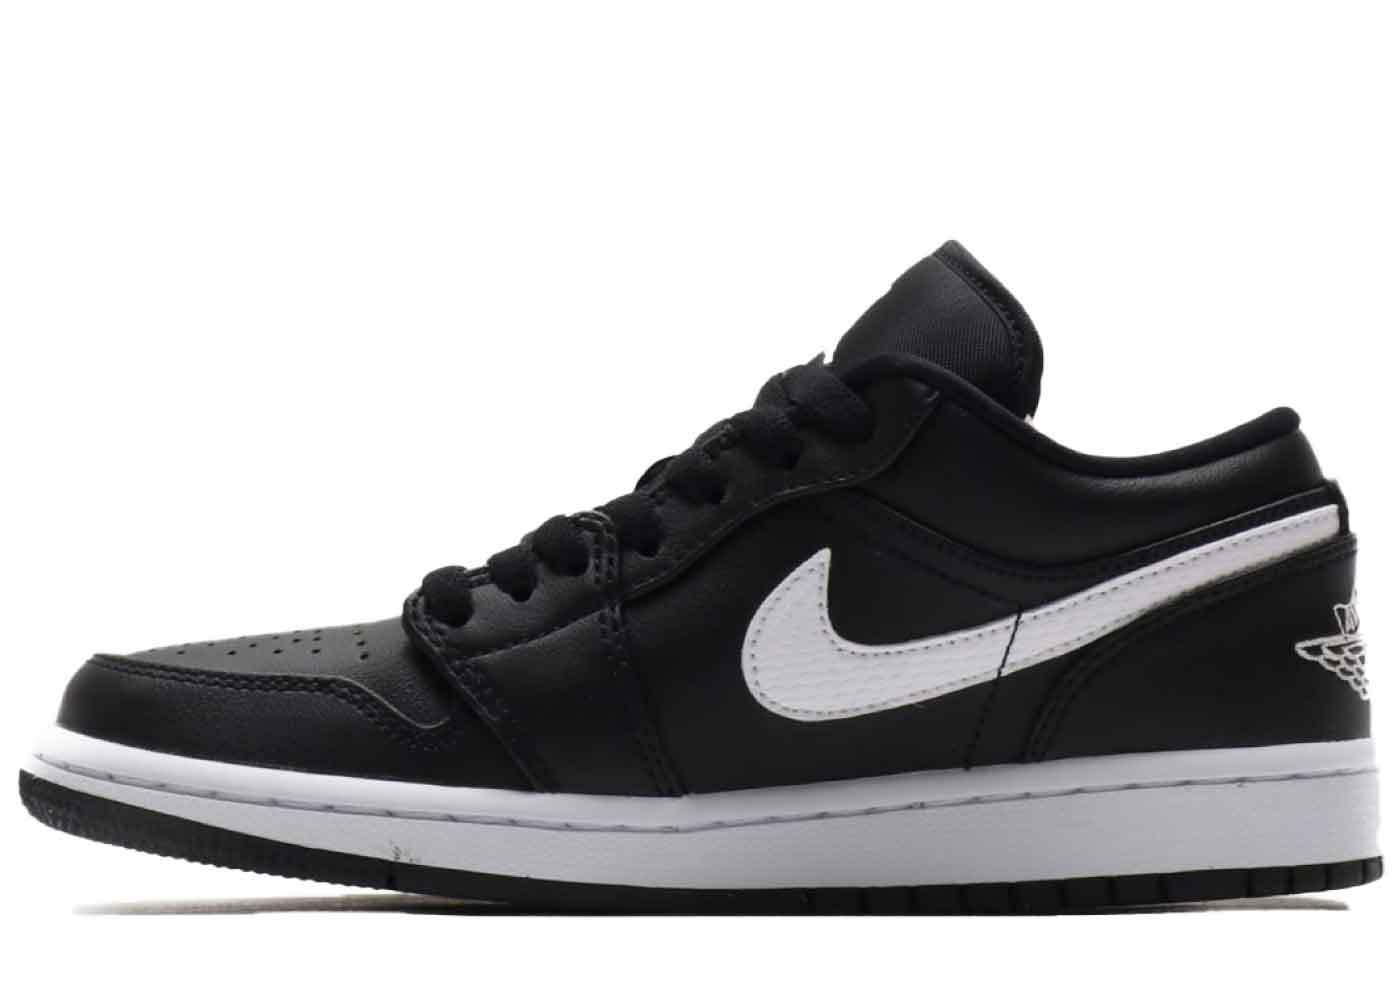 Nike Air Jordan 1 Low Black/White Womensの写真